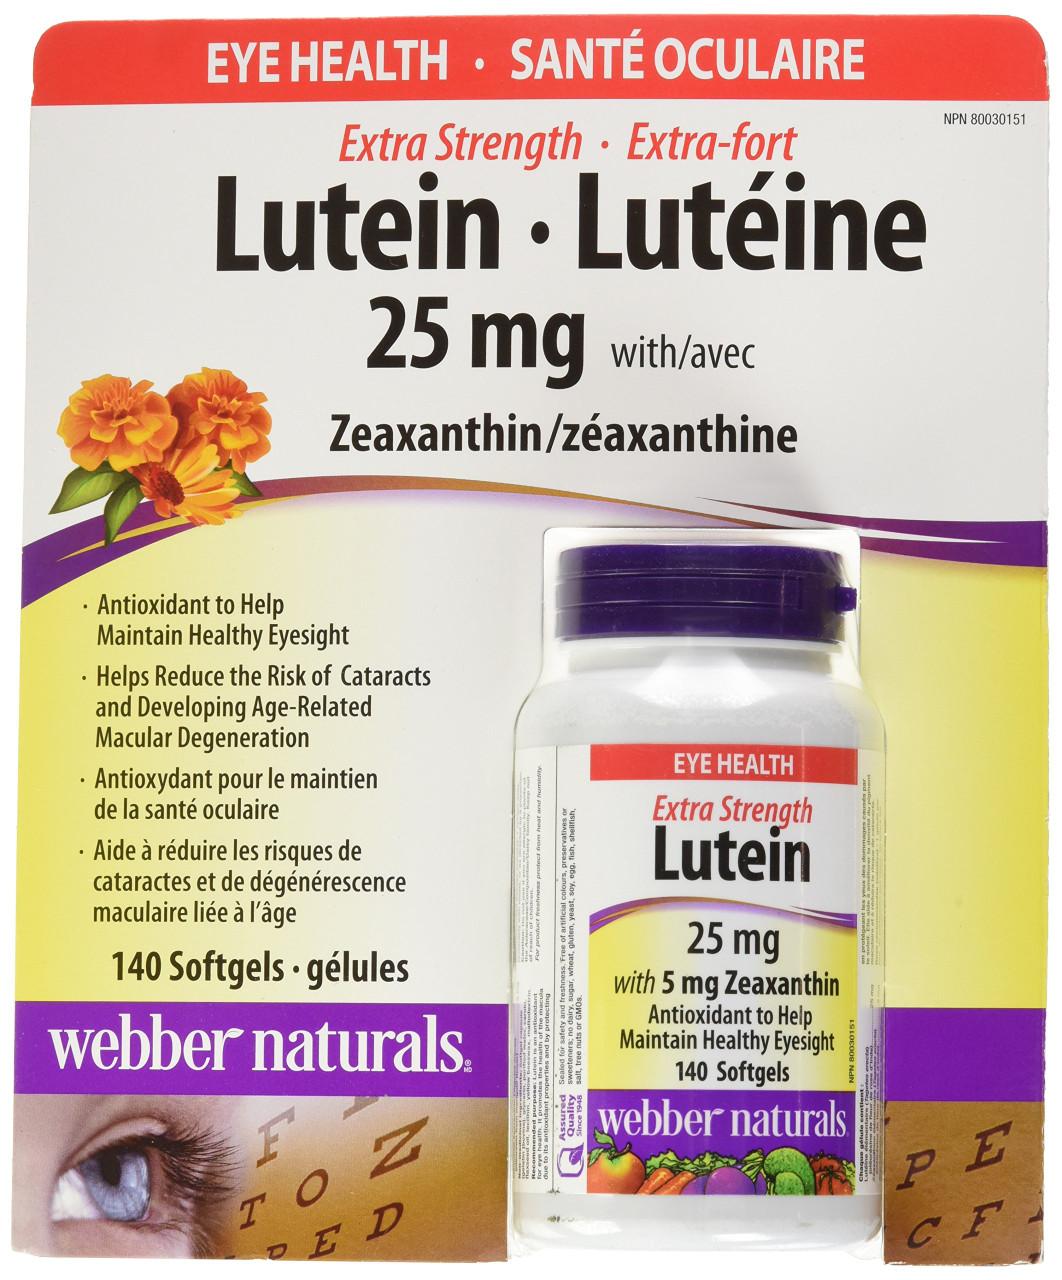 Webber Naturals Extra Strength Lutein 140 Softgels 25mg